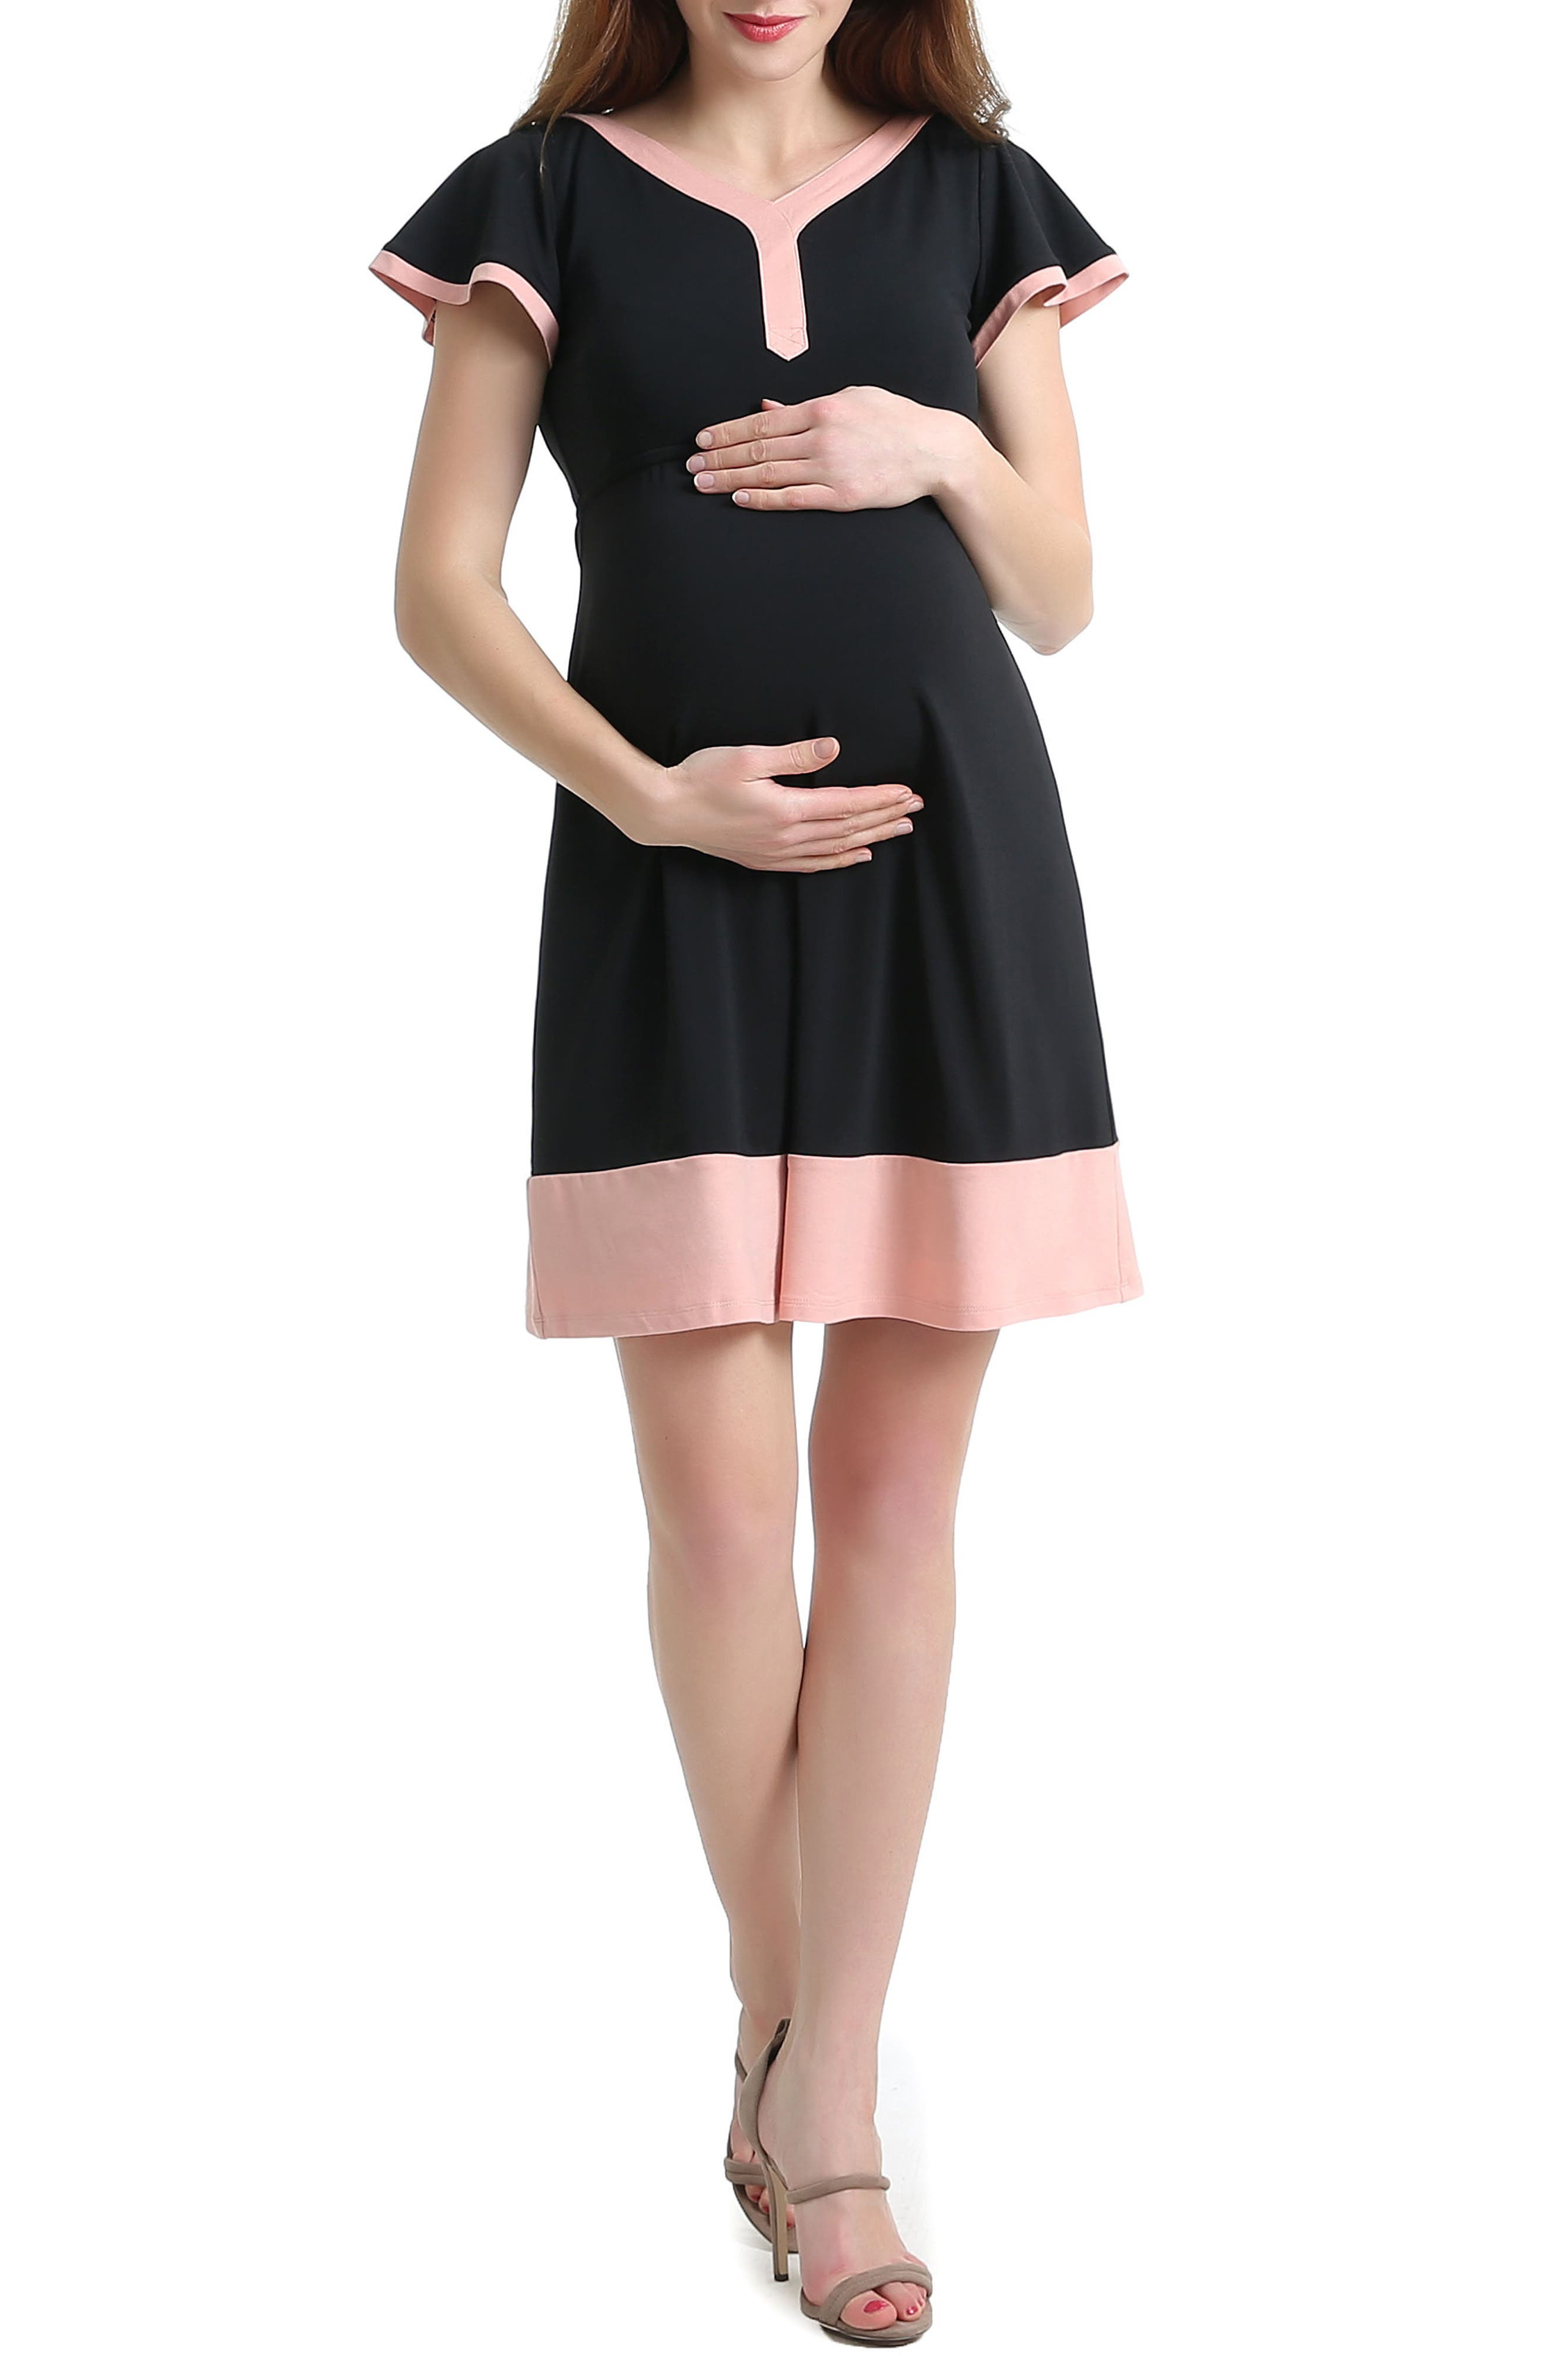 Regan Colorblock Skater Maternity Dress,                             Main thumbnail 1, color,                             Black